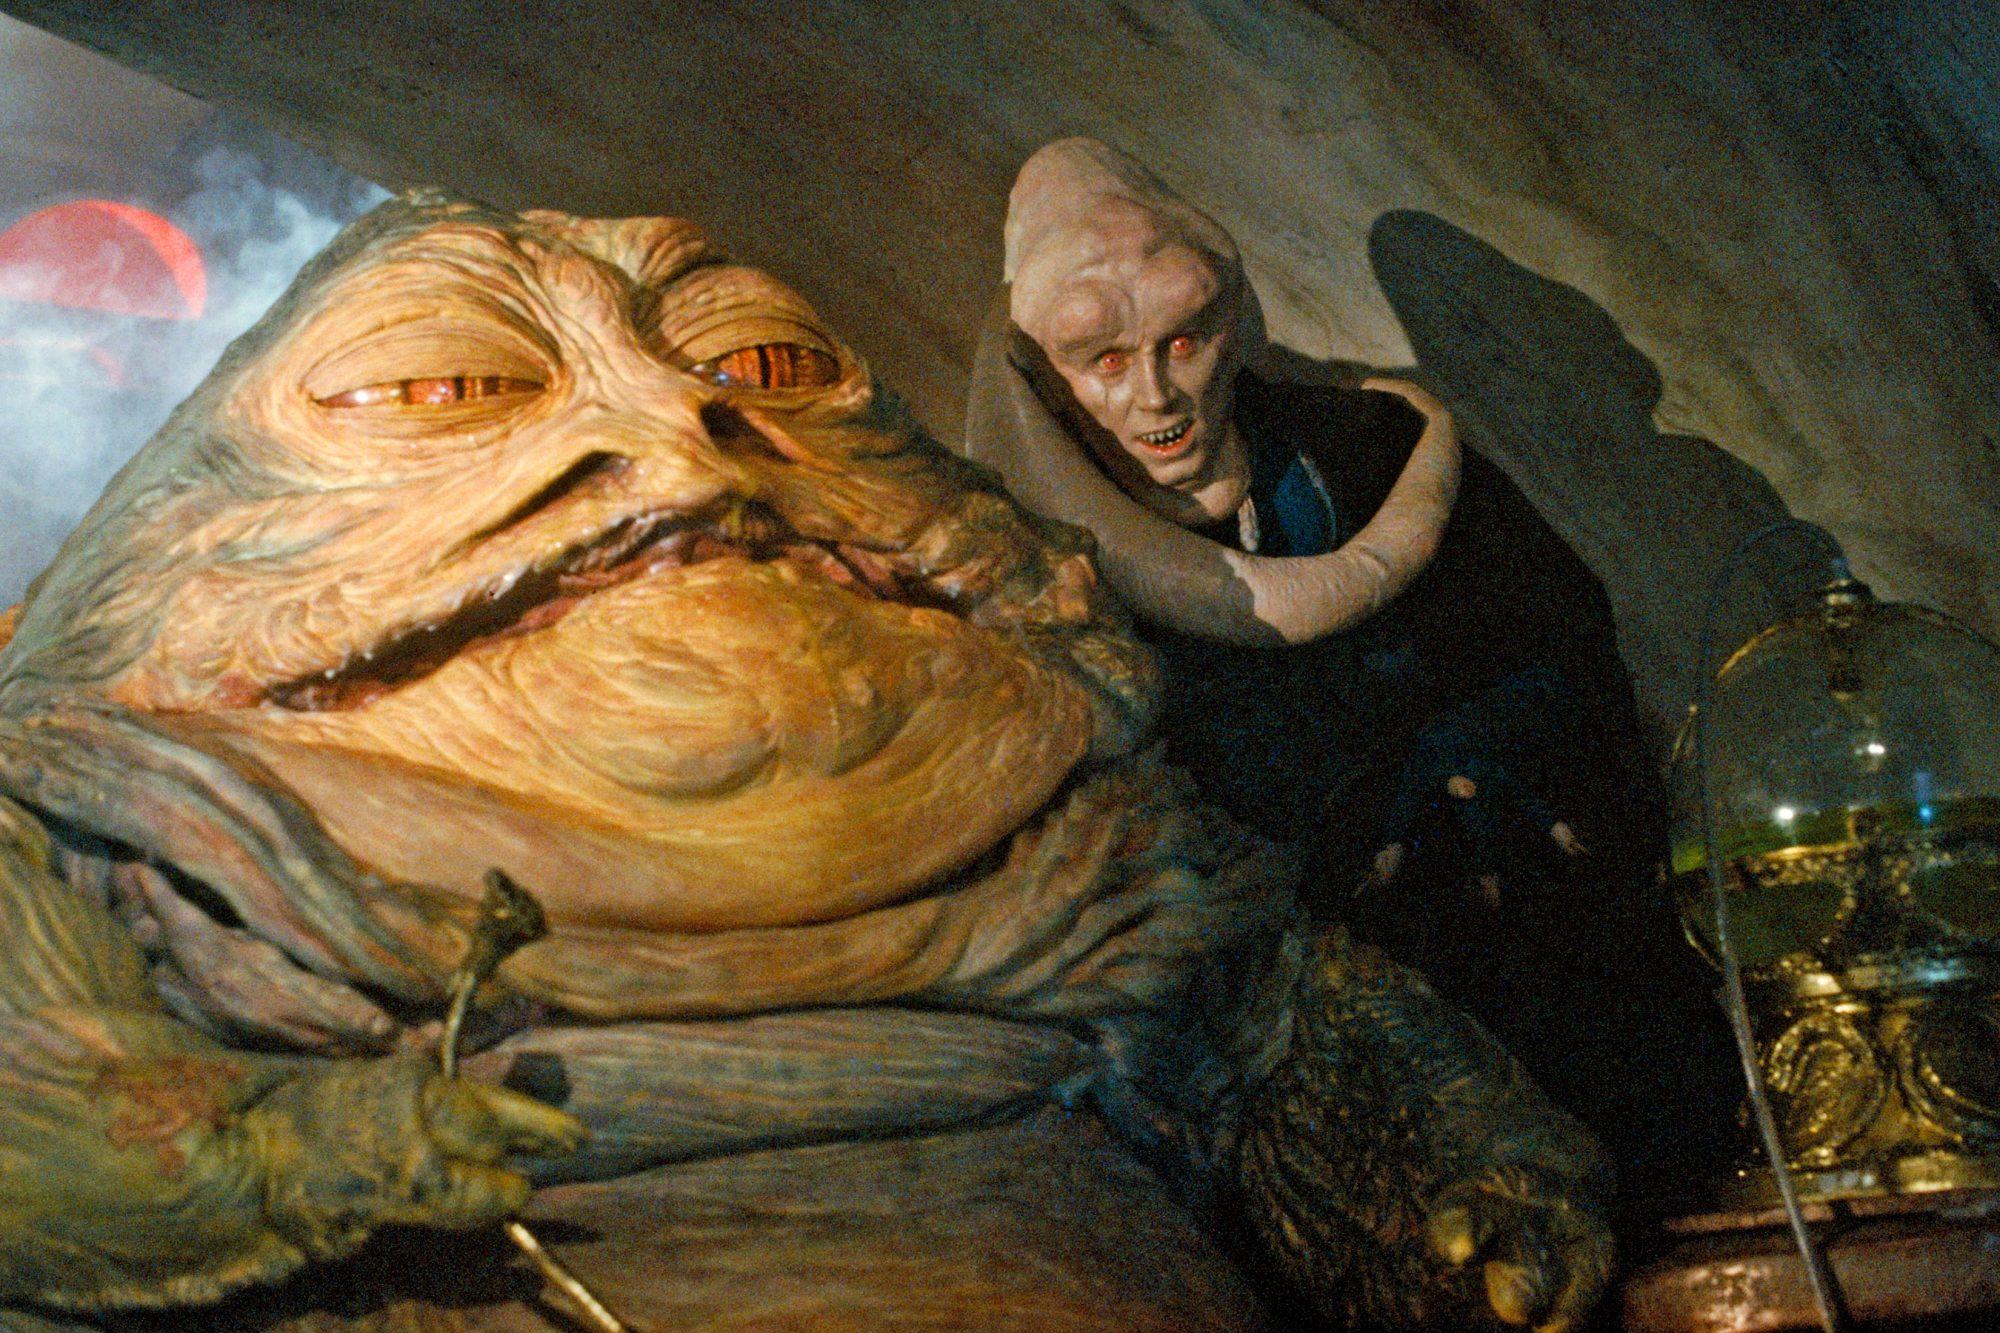 Star Wars: Episode VI - Return of the JediJabba the Hutt